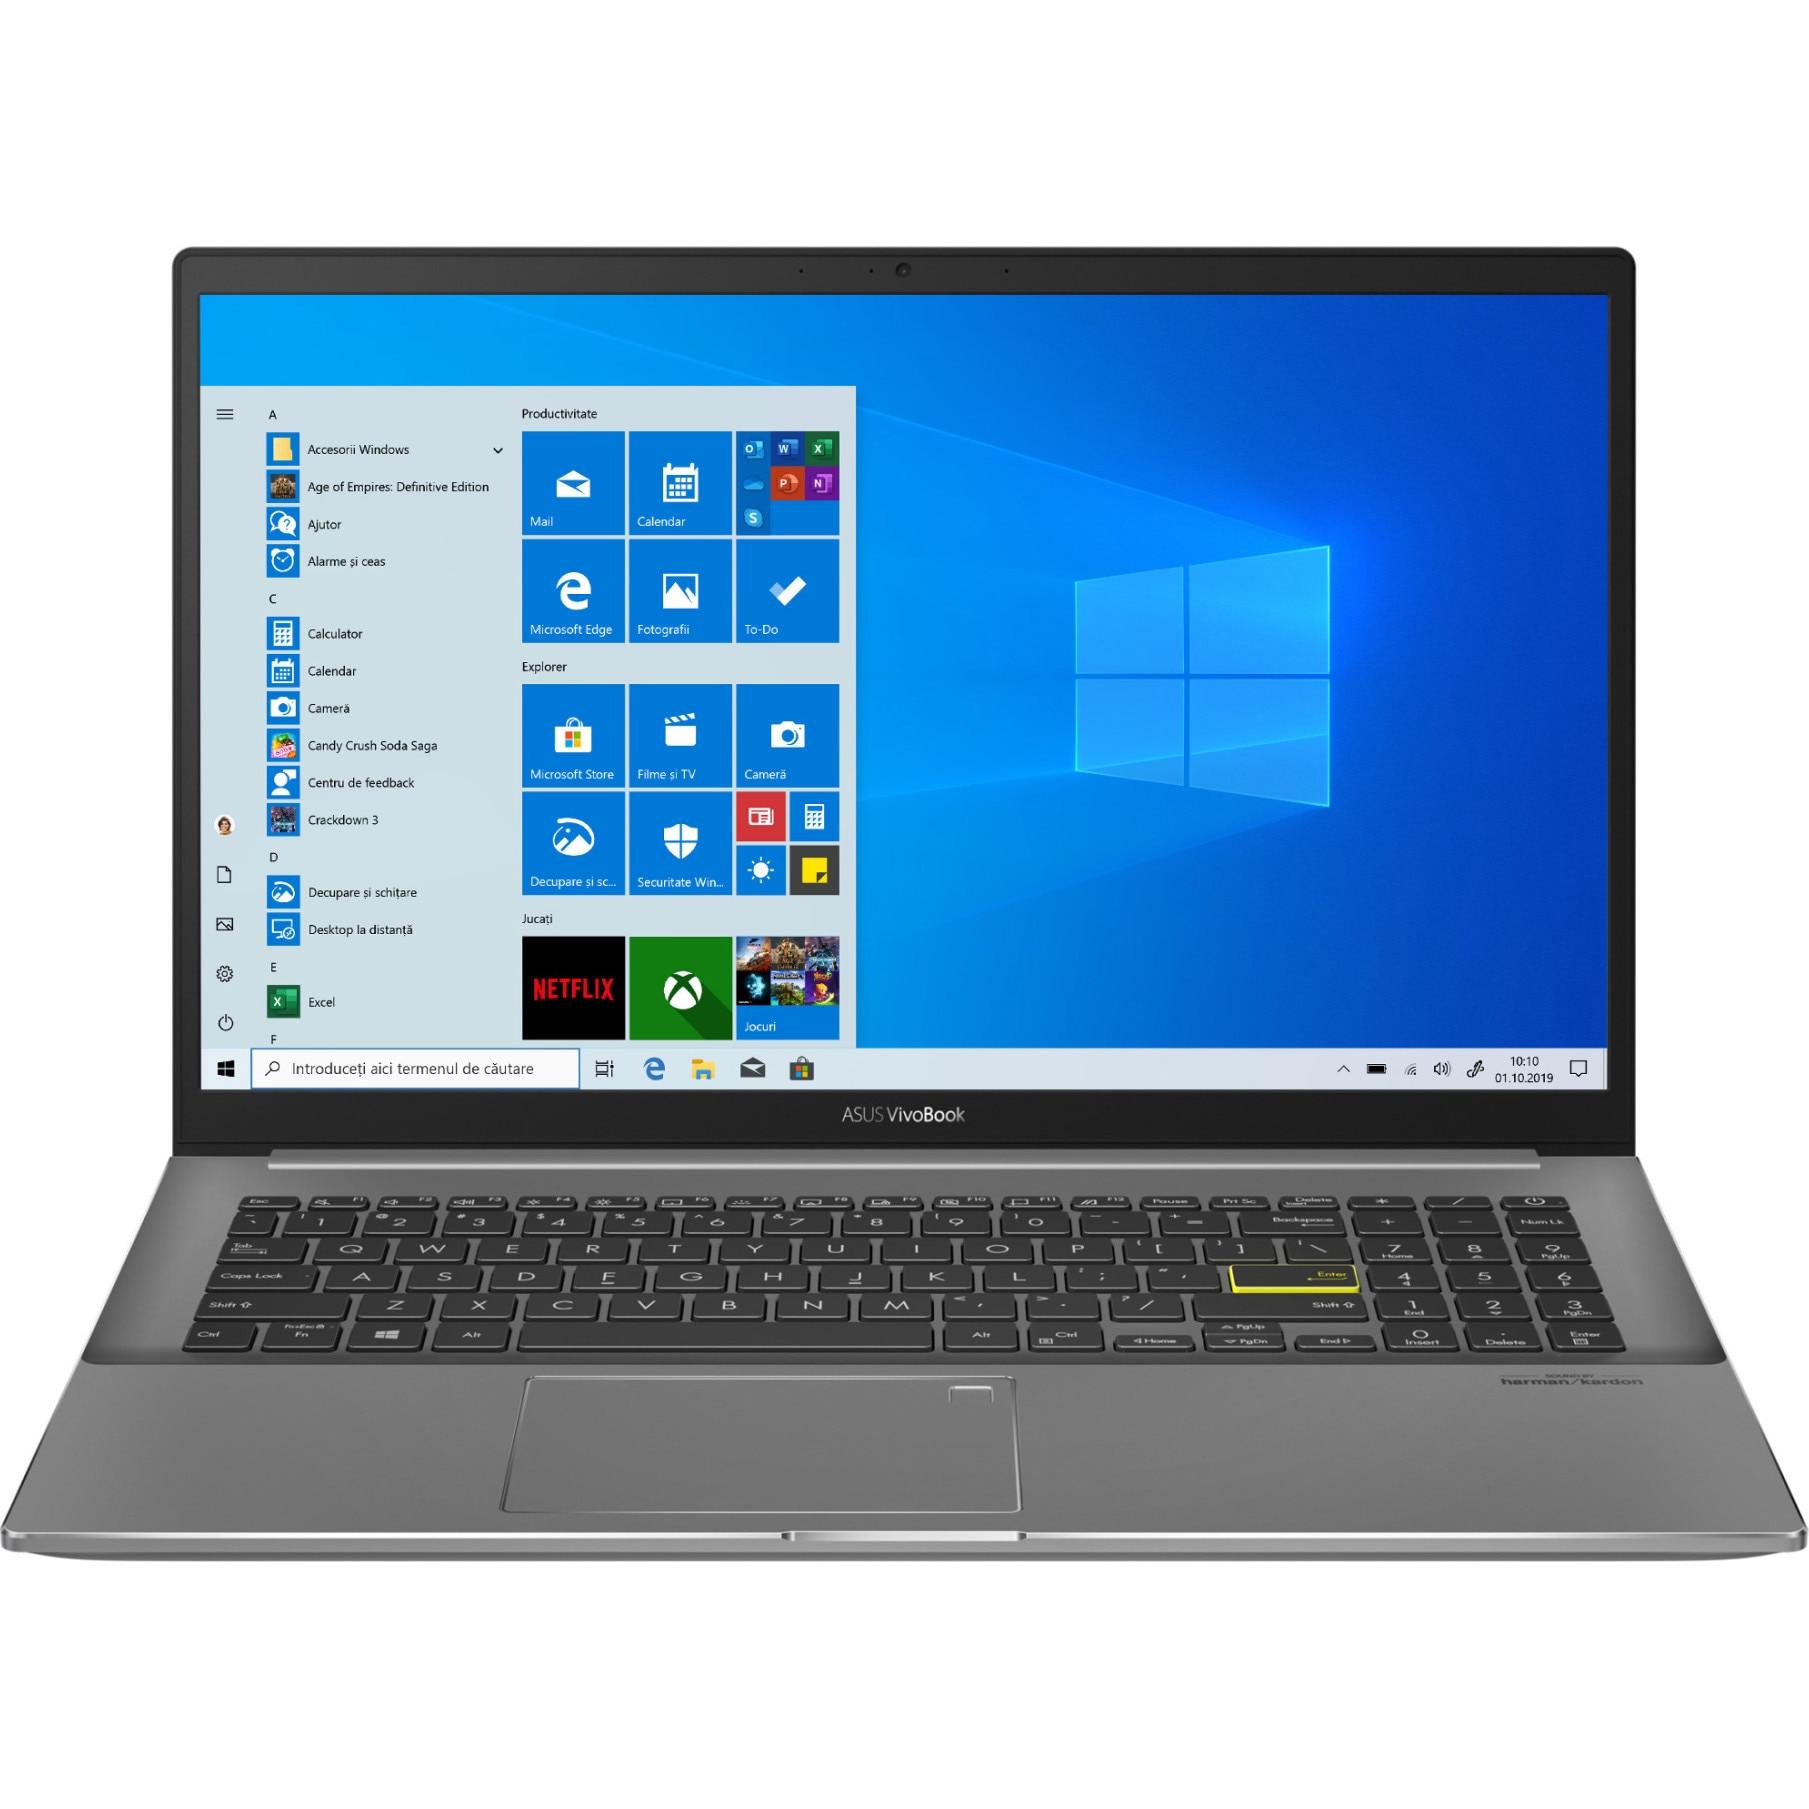 "Fotografie Laptop ASUS VivoBook S15 S533EA cu procesor Intel® Core™ i7-1165G7 pana la 4.70 GHz, 15.6"", Full HD, 8GB, 512GB SSD, Intel Iris Xᵉ Graphics, Windows 10 Home, Indie Black"